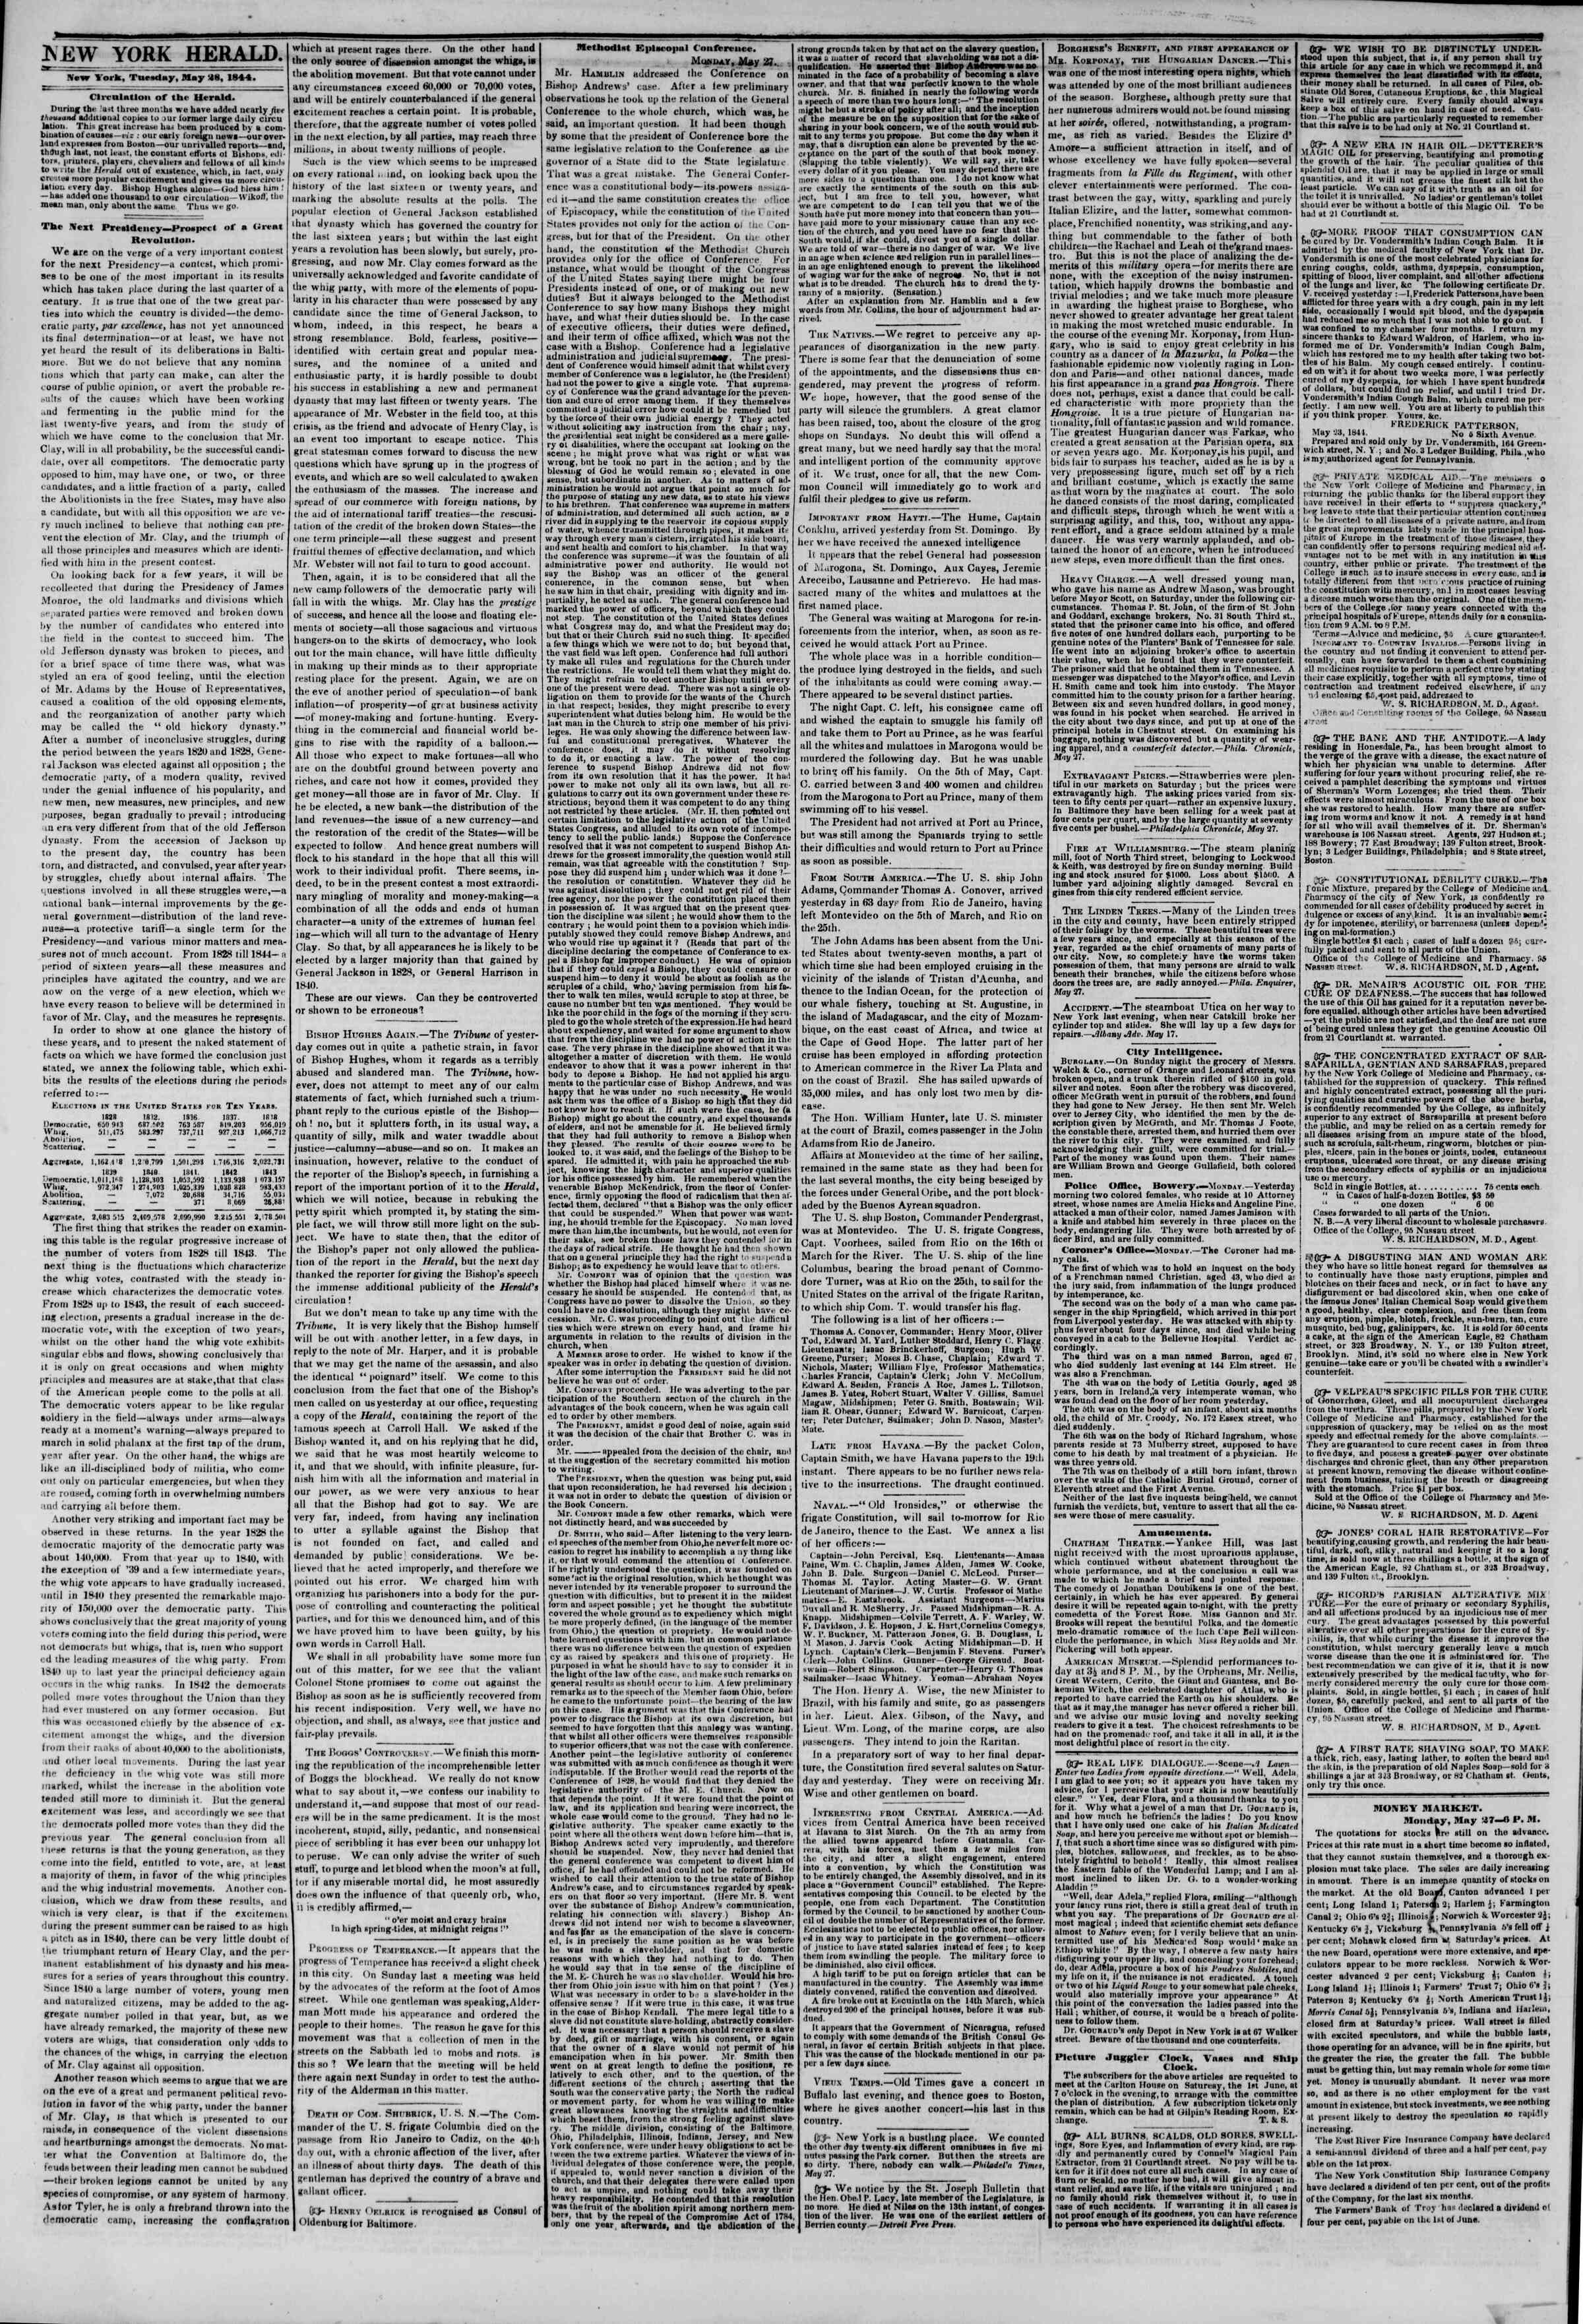 May 28, 1844 Tarihli The New York Herald Gazetesi Sayfa 2